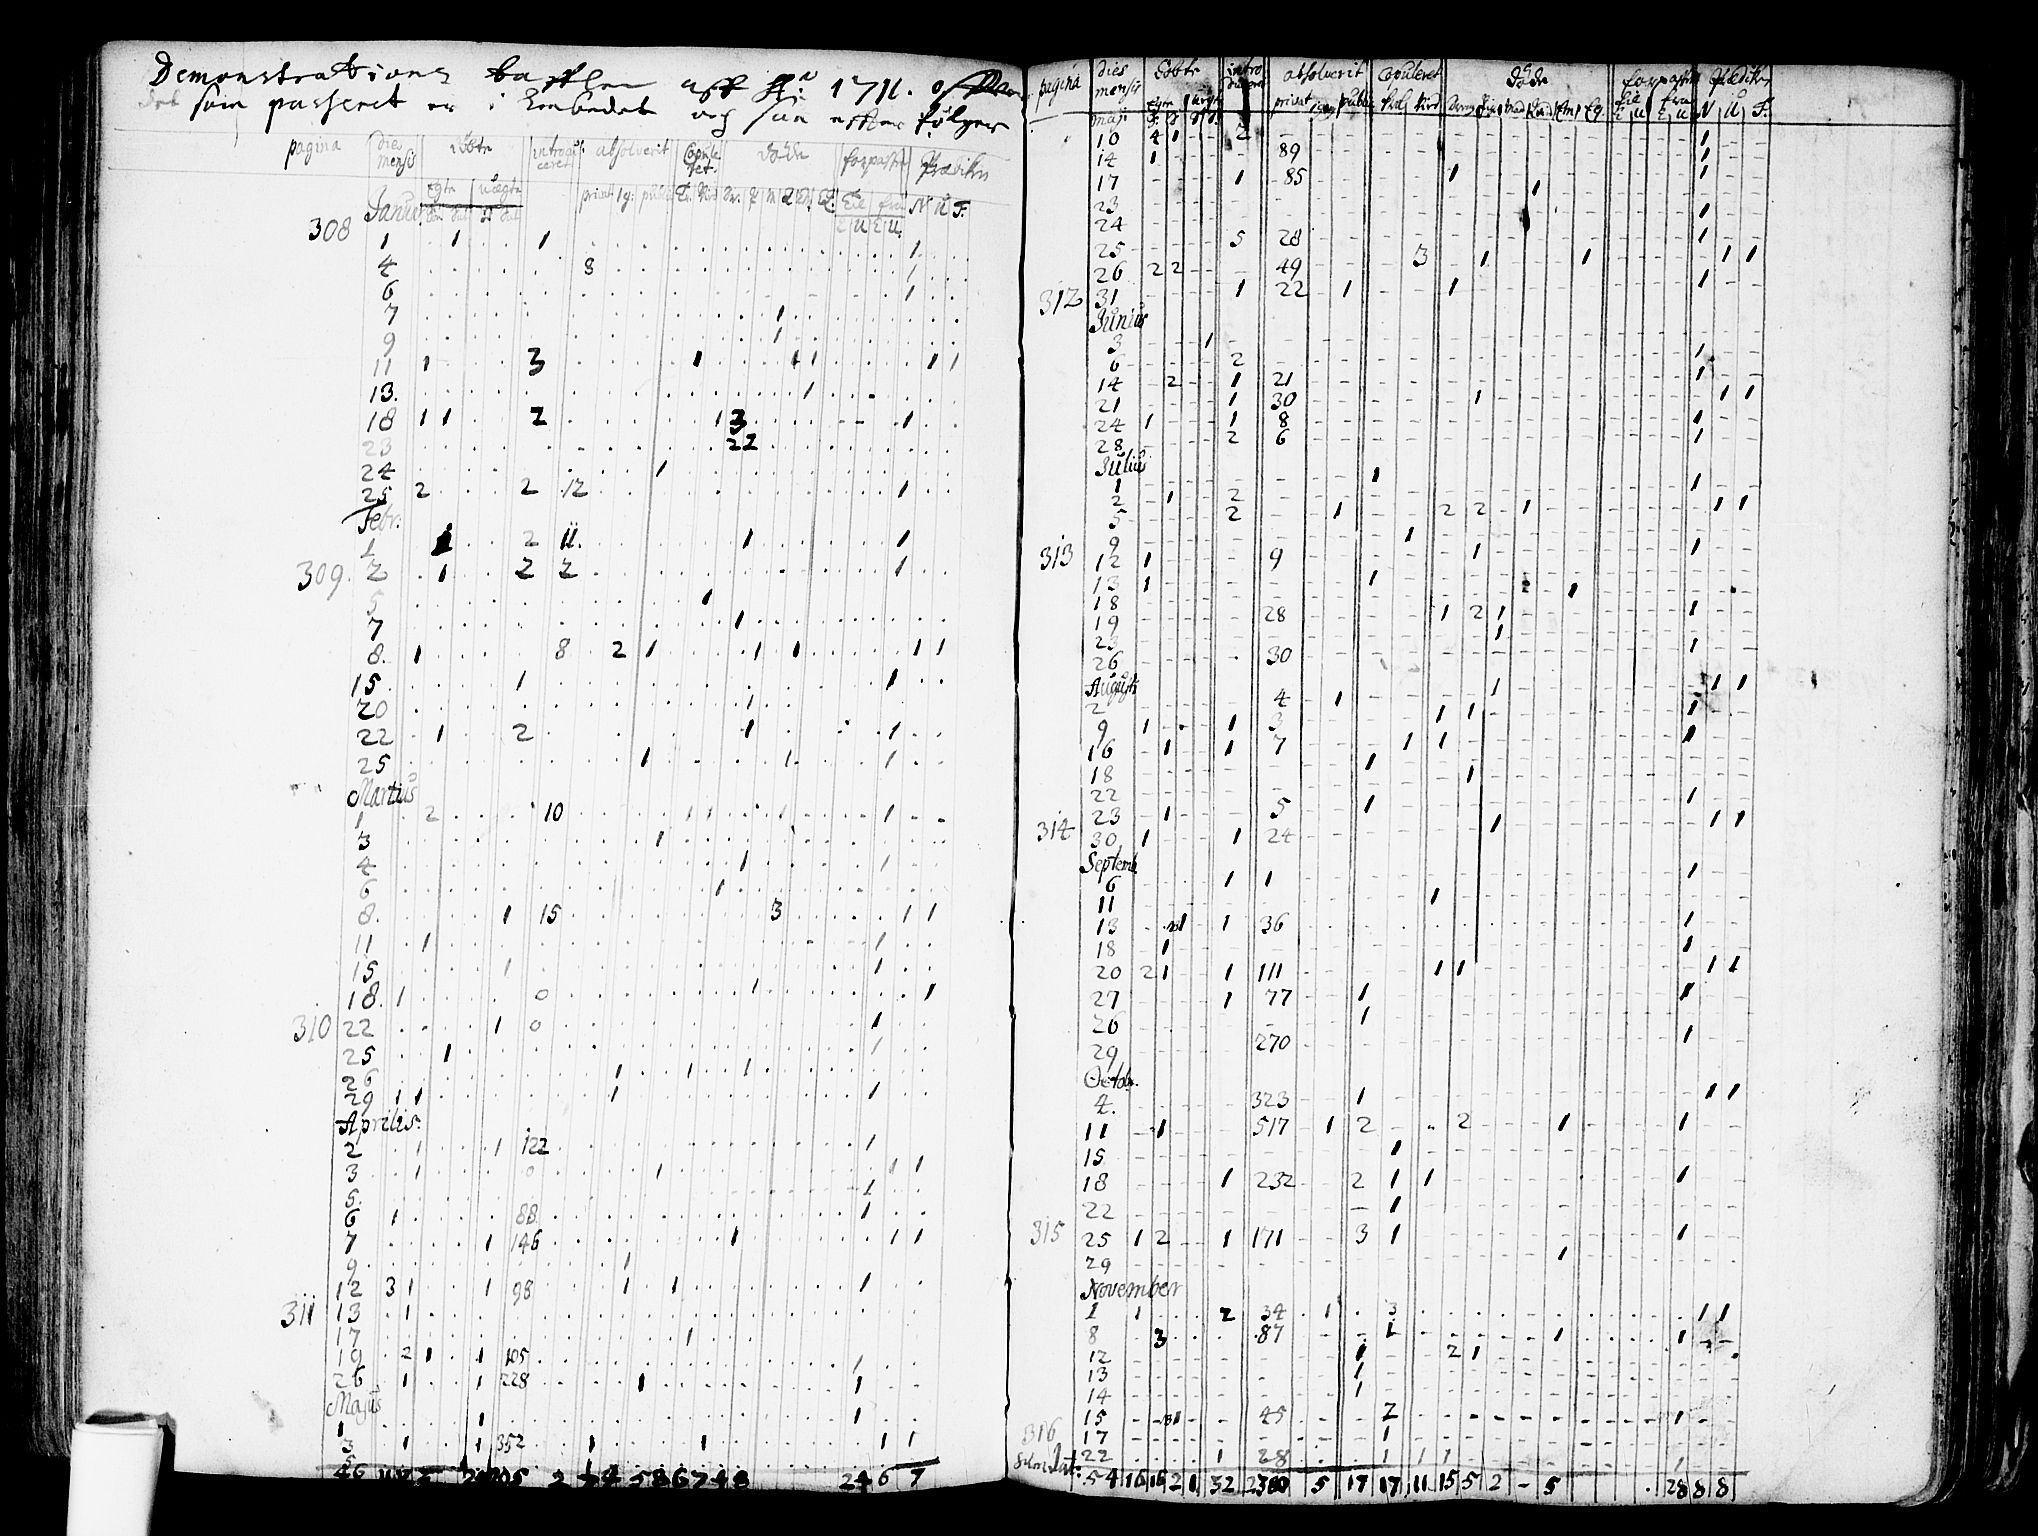 SAO, Nes prestekontor Kirkebøker, F/Fa/L0001: Ministerialbok nr. I 1, 1689-1716, s. 307d-307e